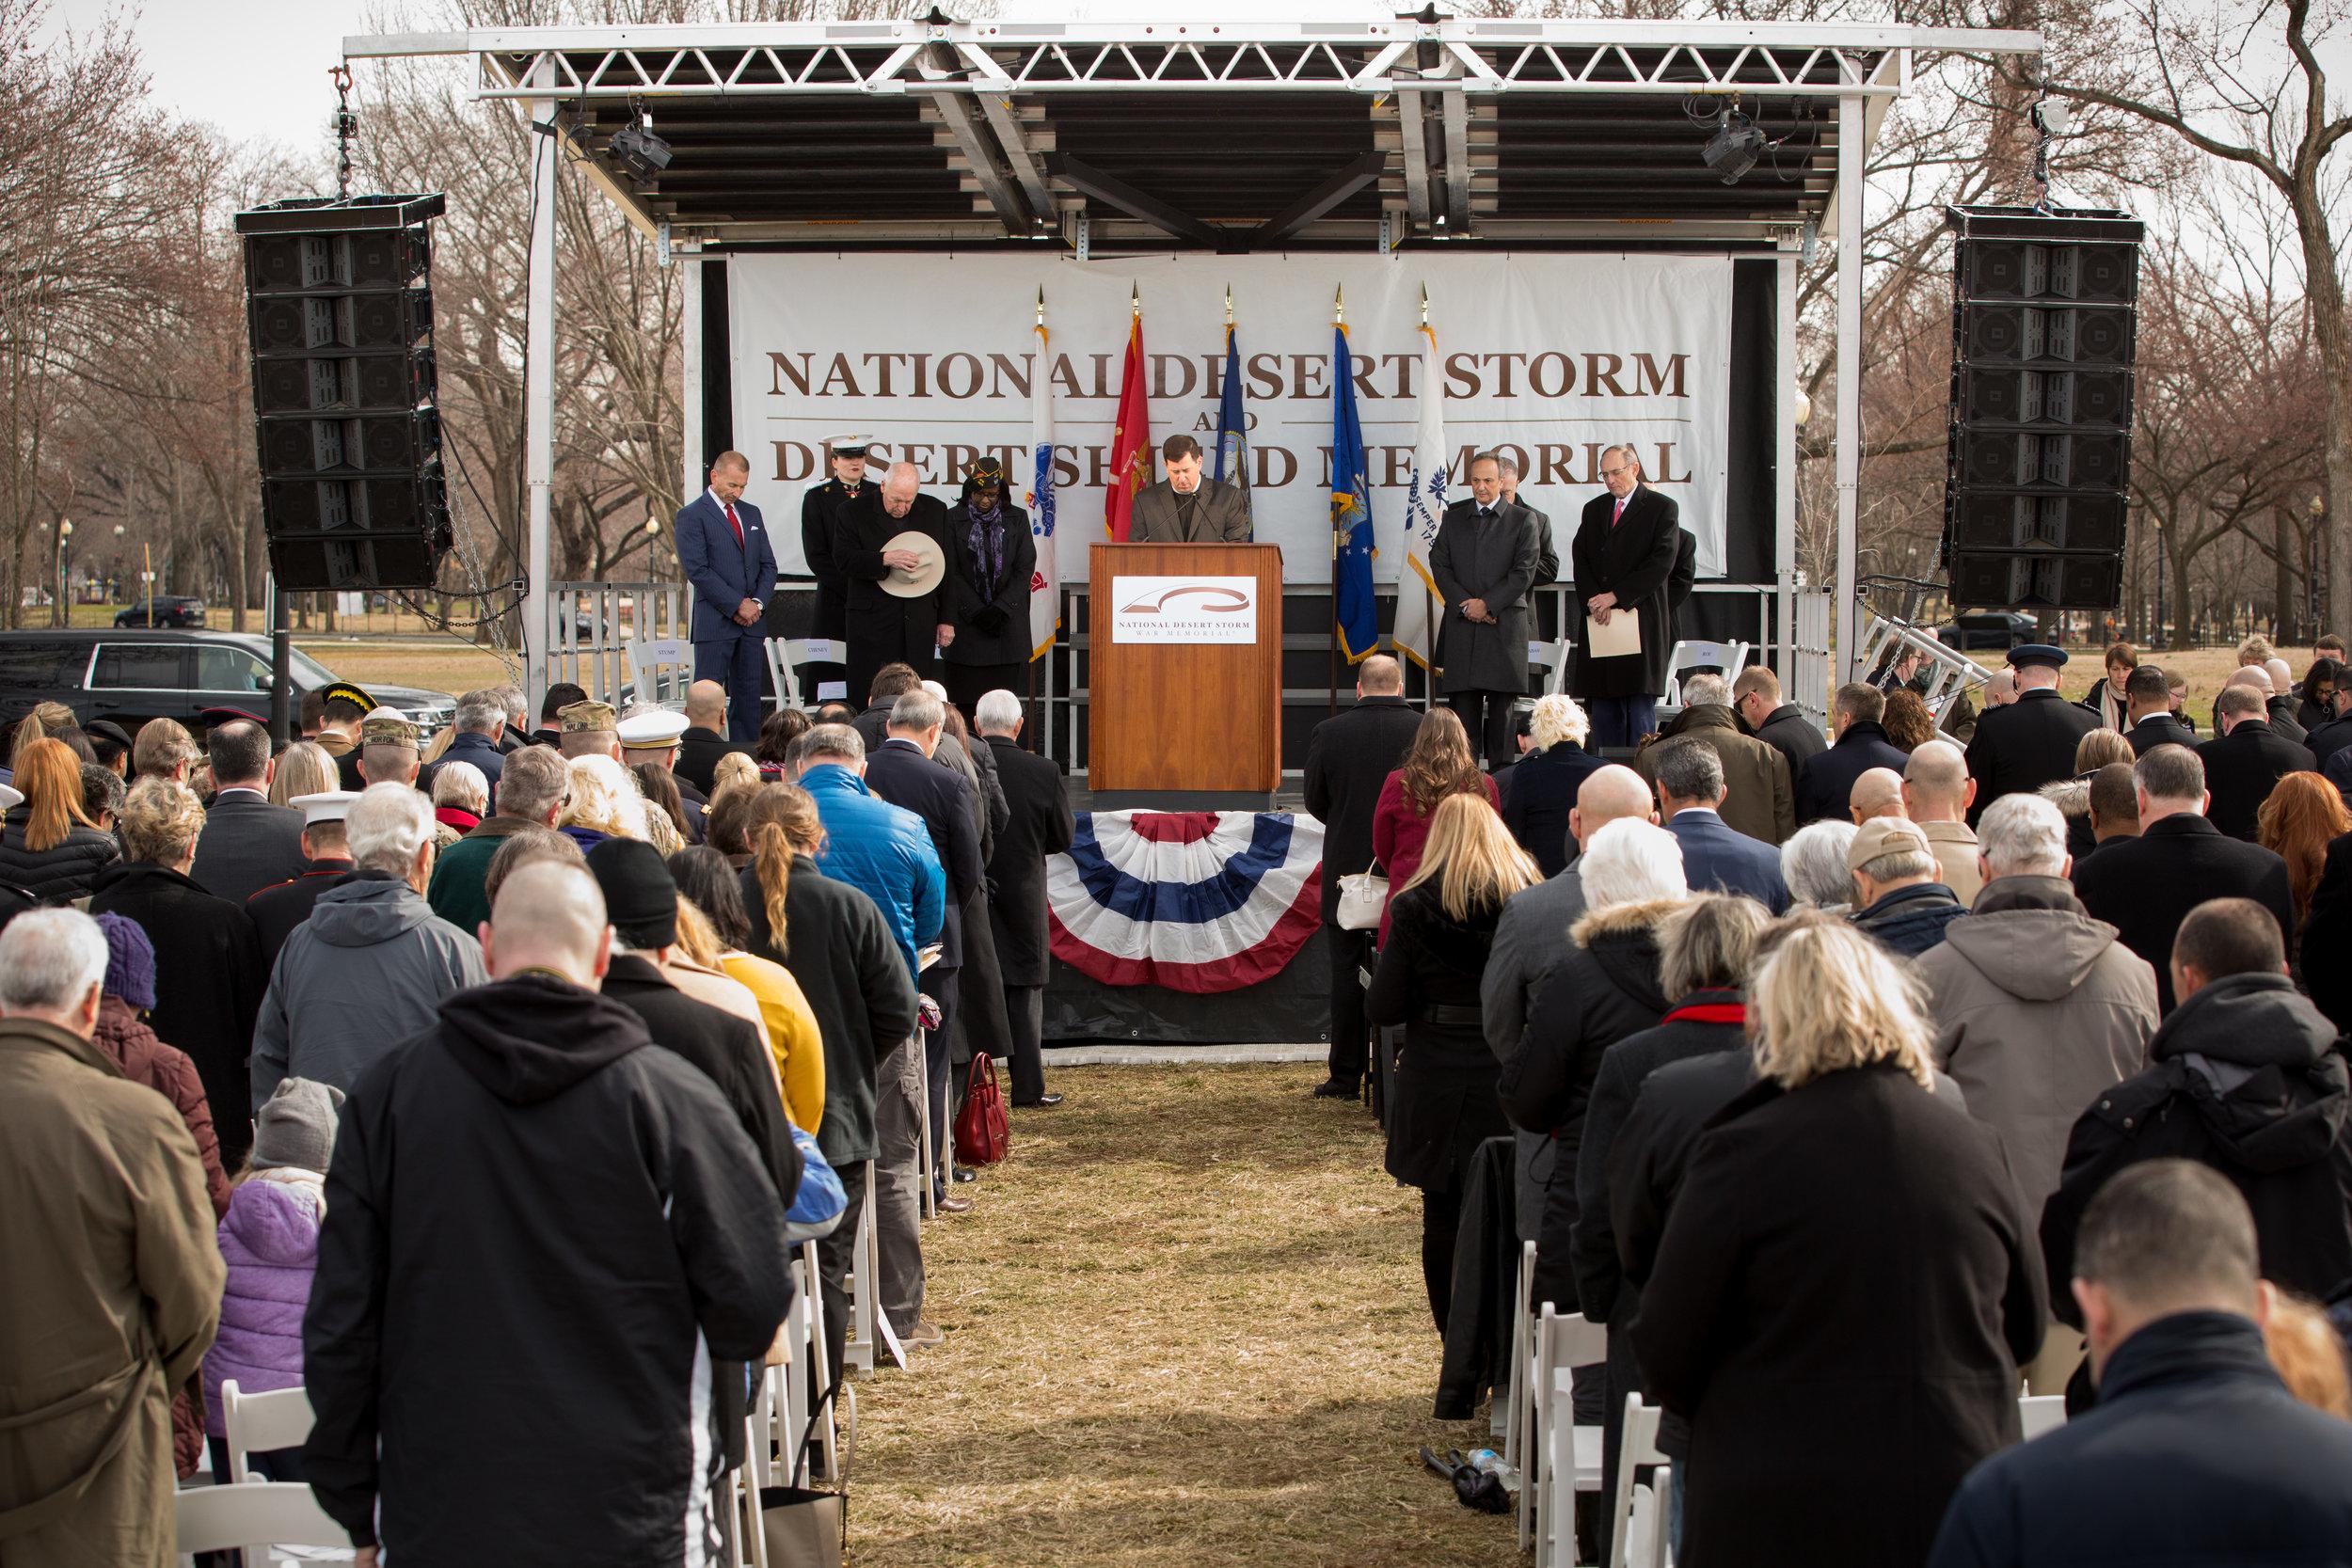 Site Dedication Ceremony in Washington D.C. (Feb 26, 2019)